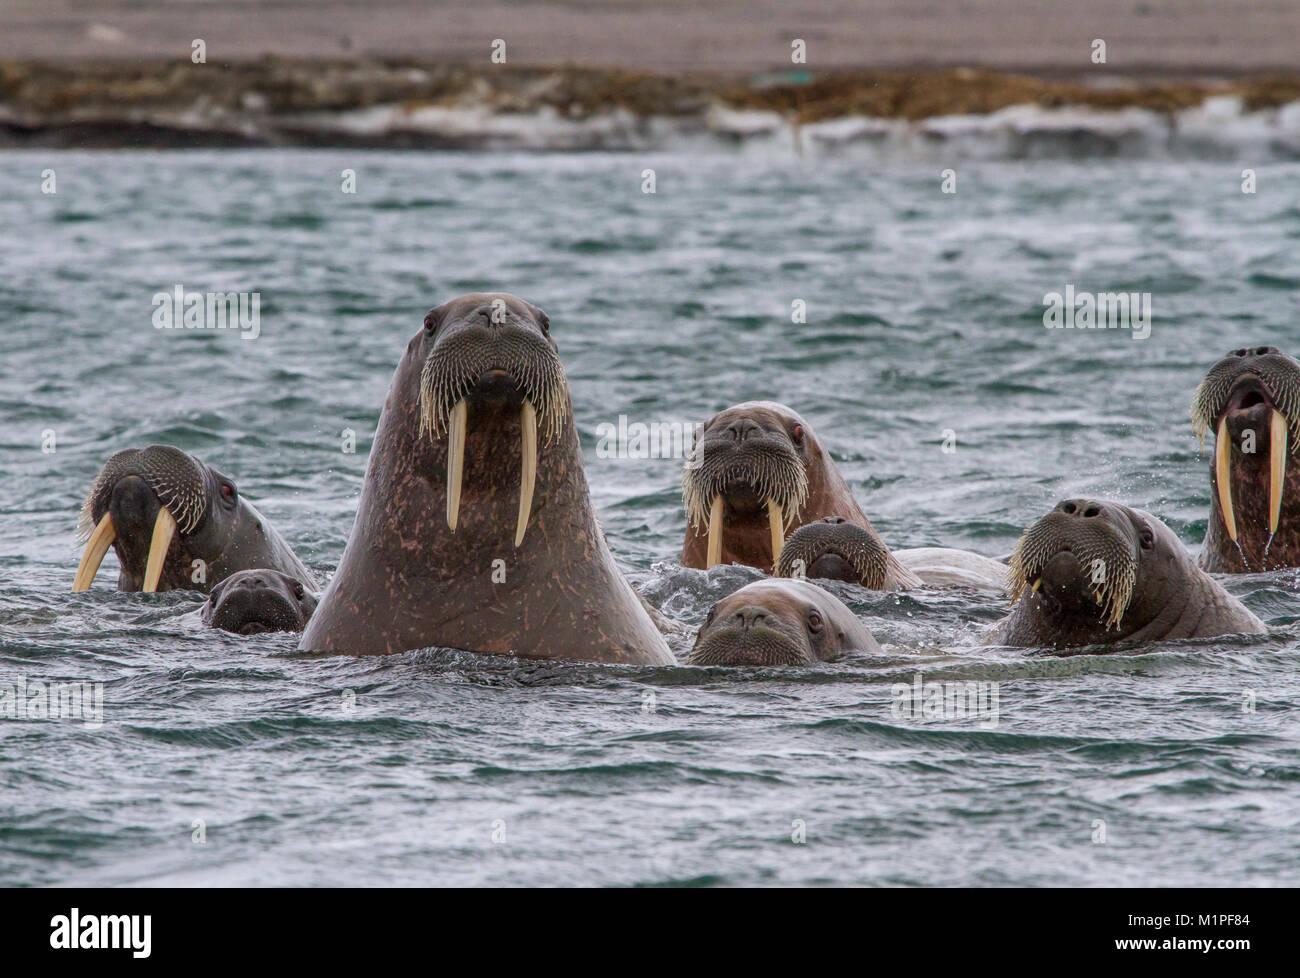 walruses in archipelago of Svalbard - Stock Image